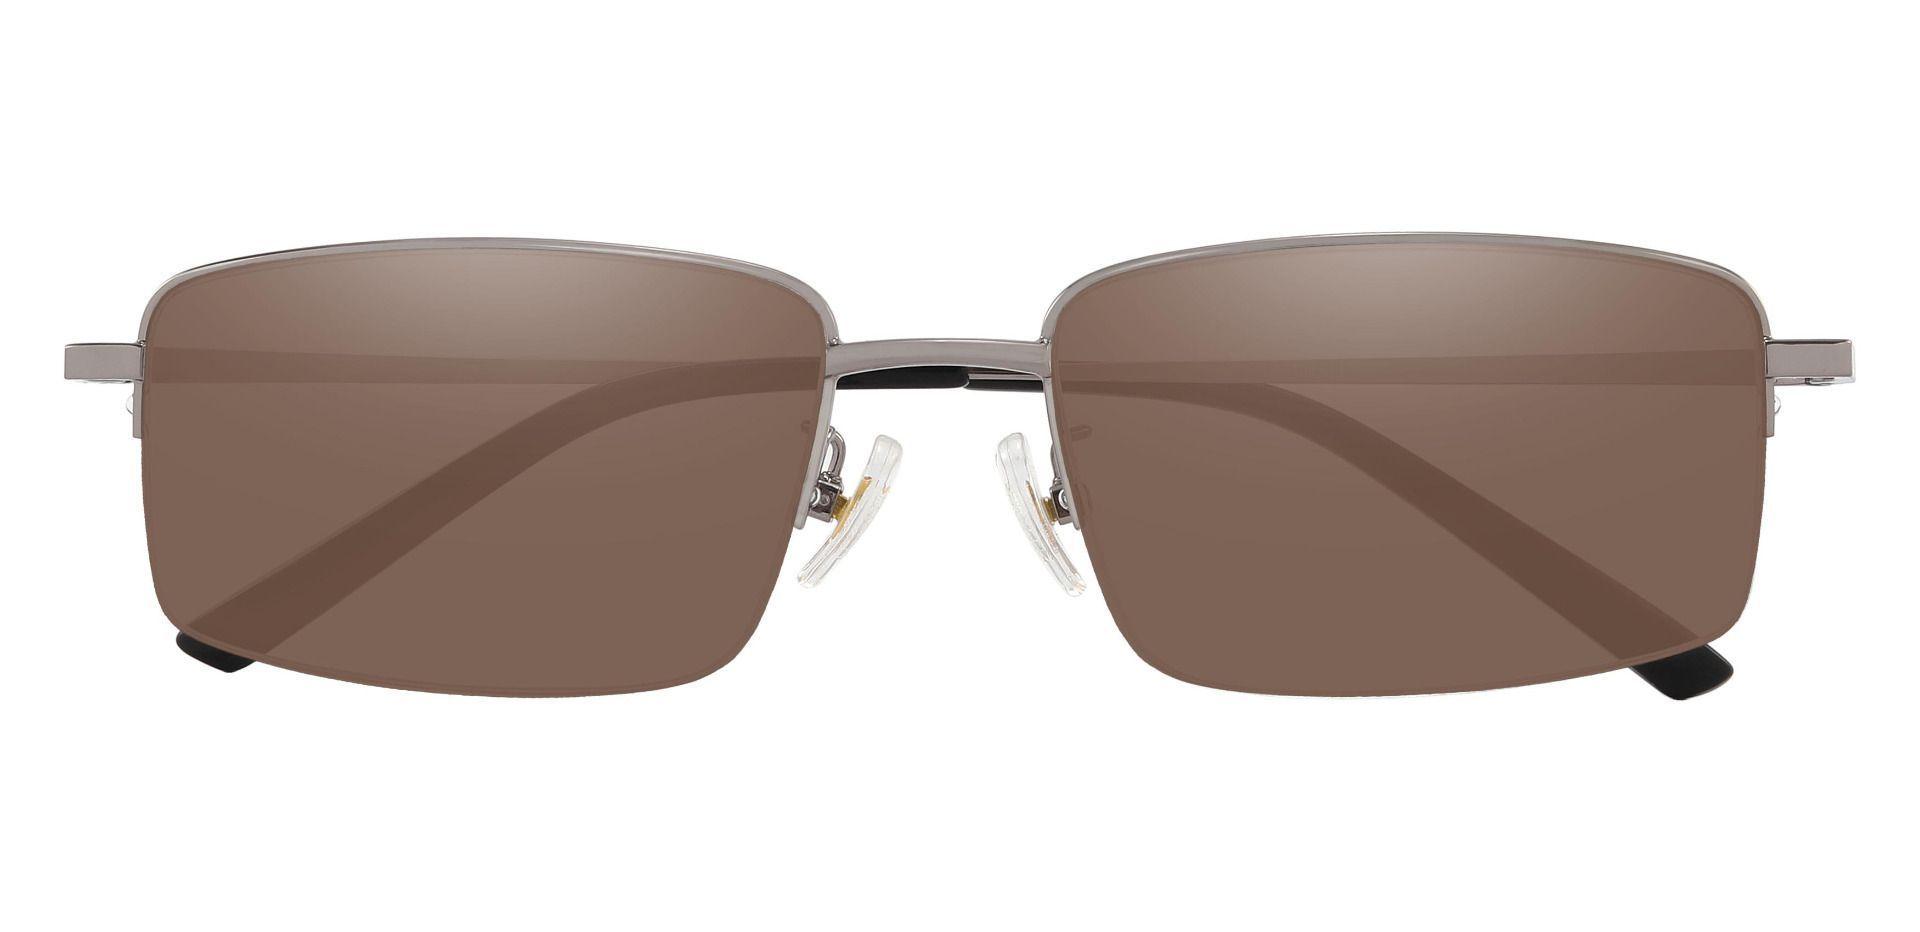 Wayne Rectangle Prescription Sunglasses - Gray Frame With Brown Lenses